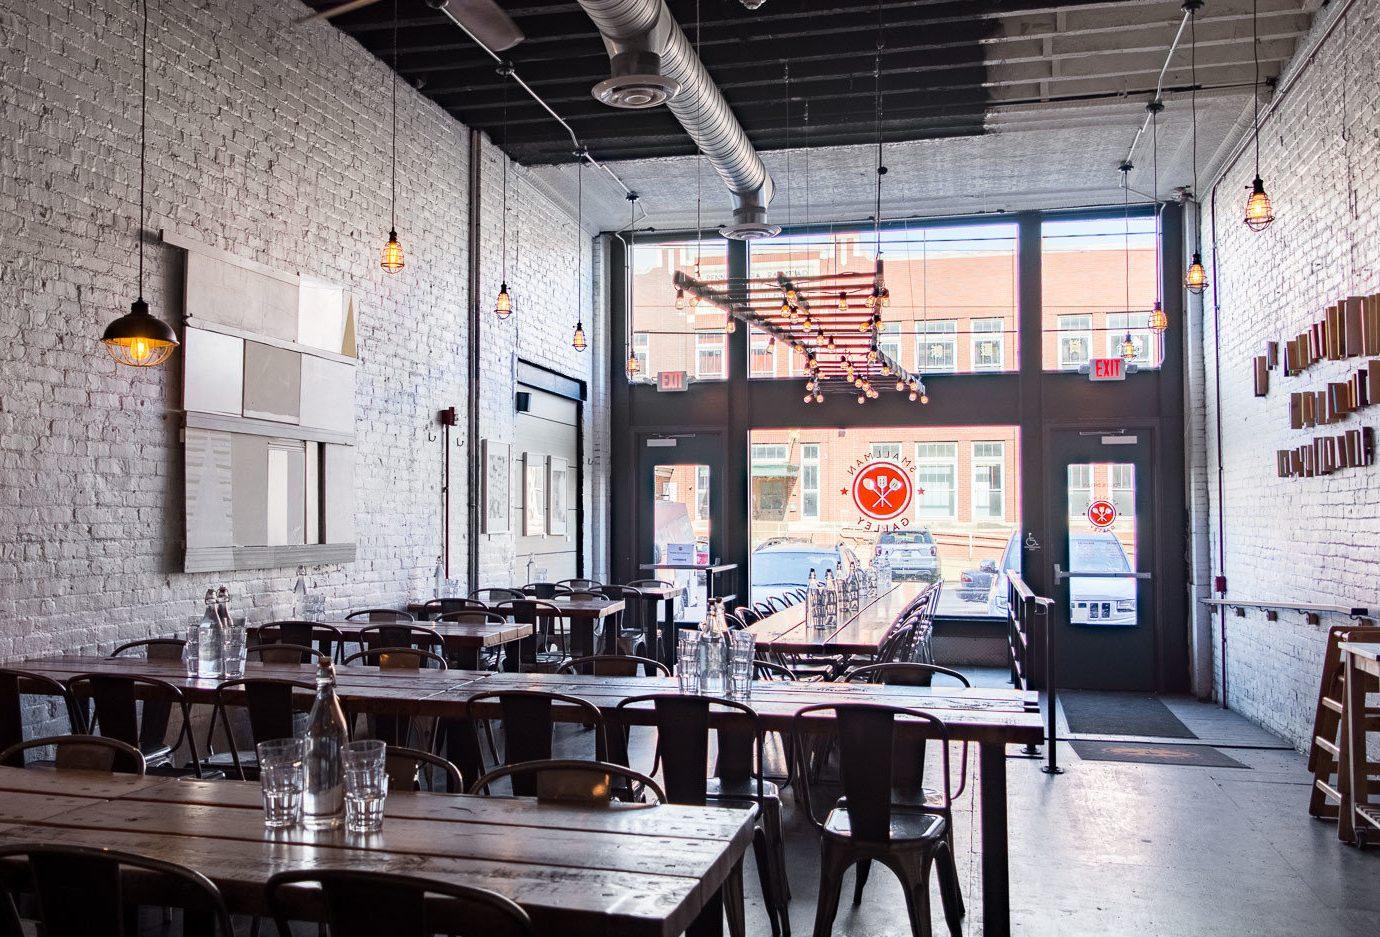 Road Trips Trip Ideas table indoor interior design loft restaurant café furniture several